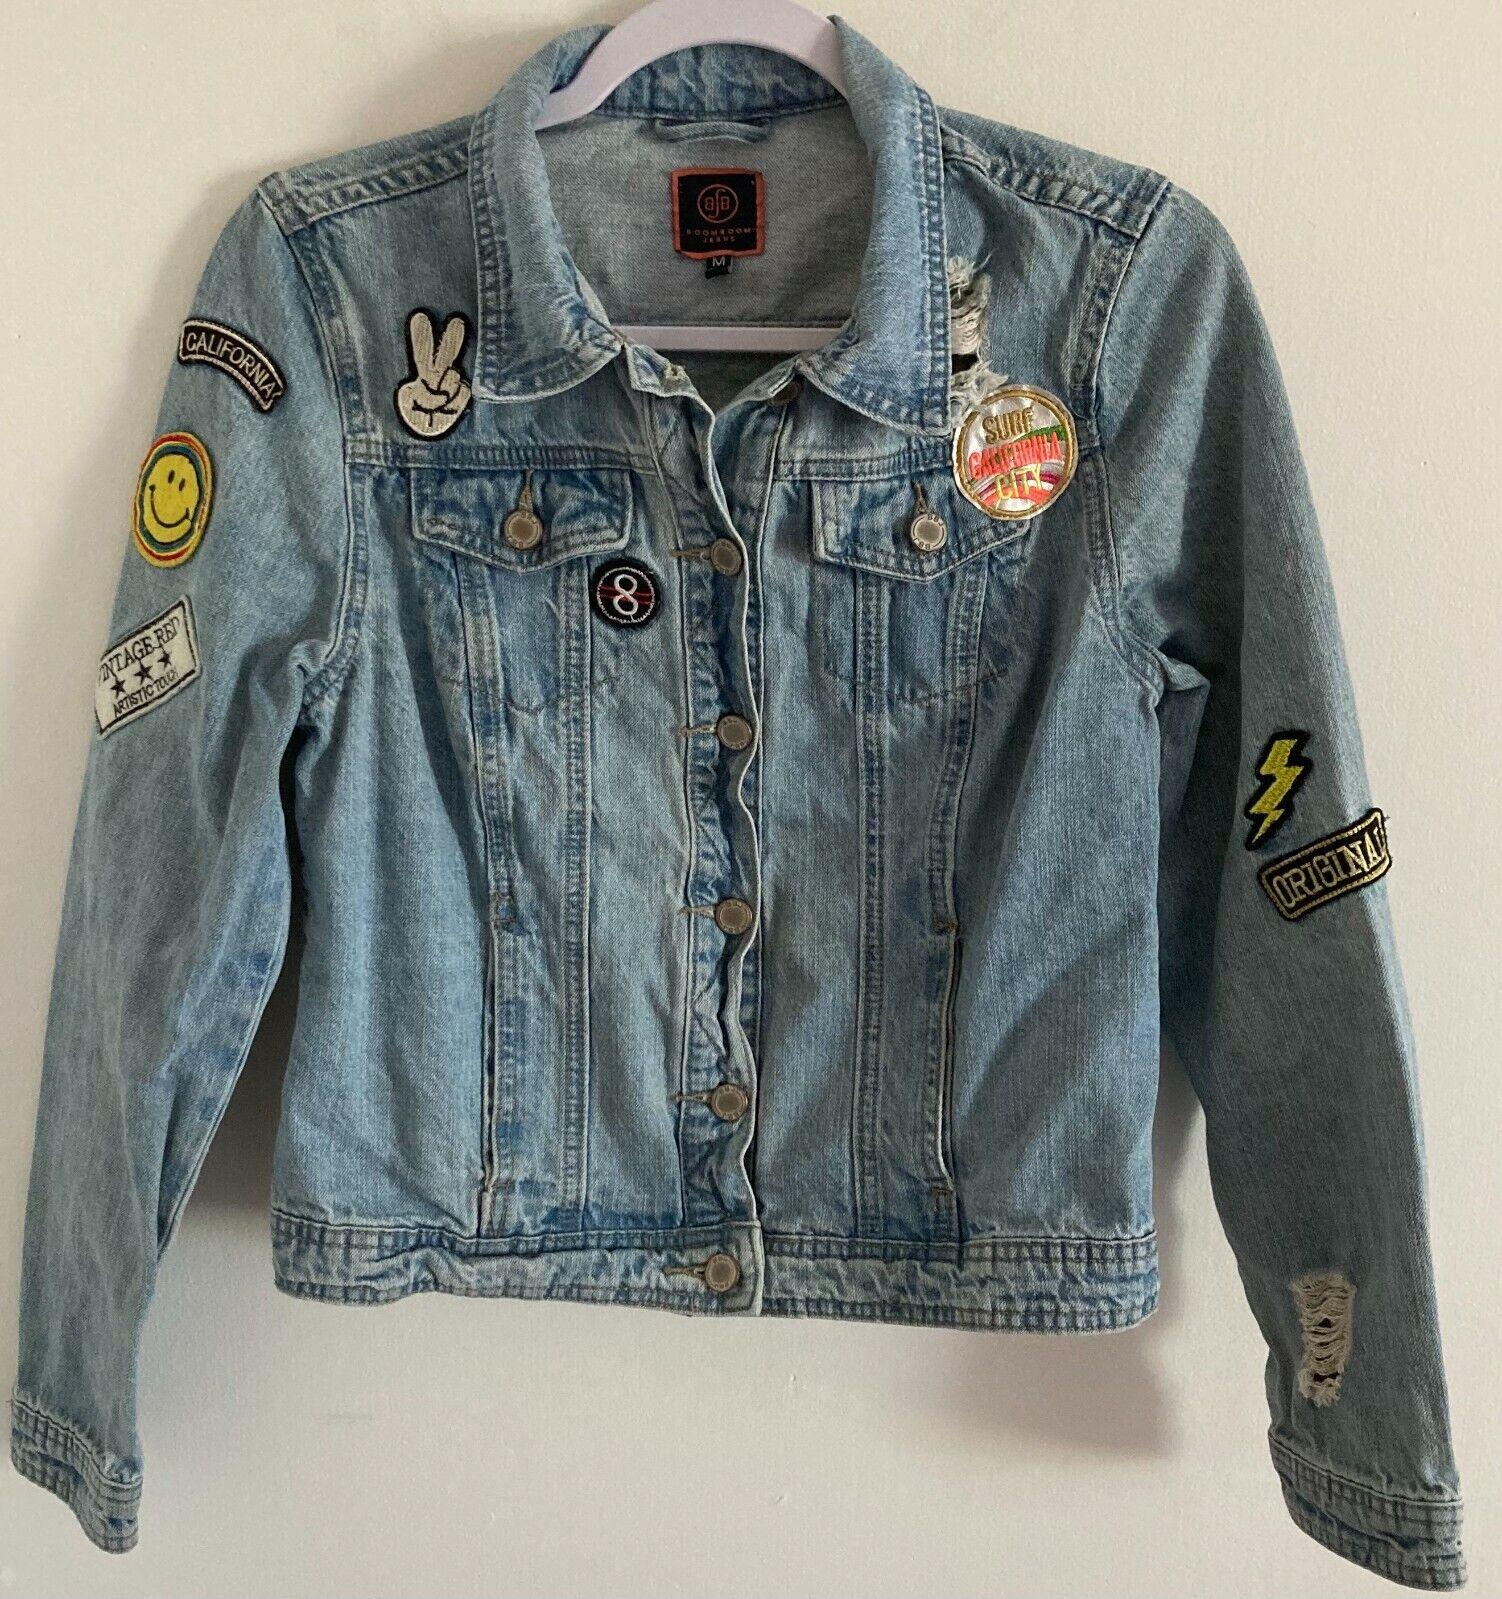 BoomBoom Jeans California Theme Jean Jacket Distressed Women's SZ Med